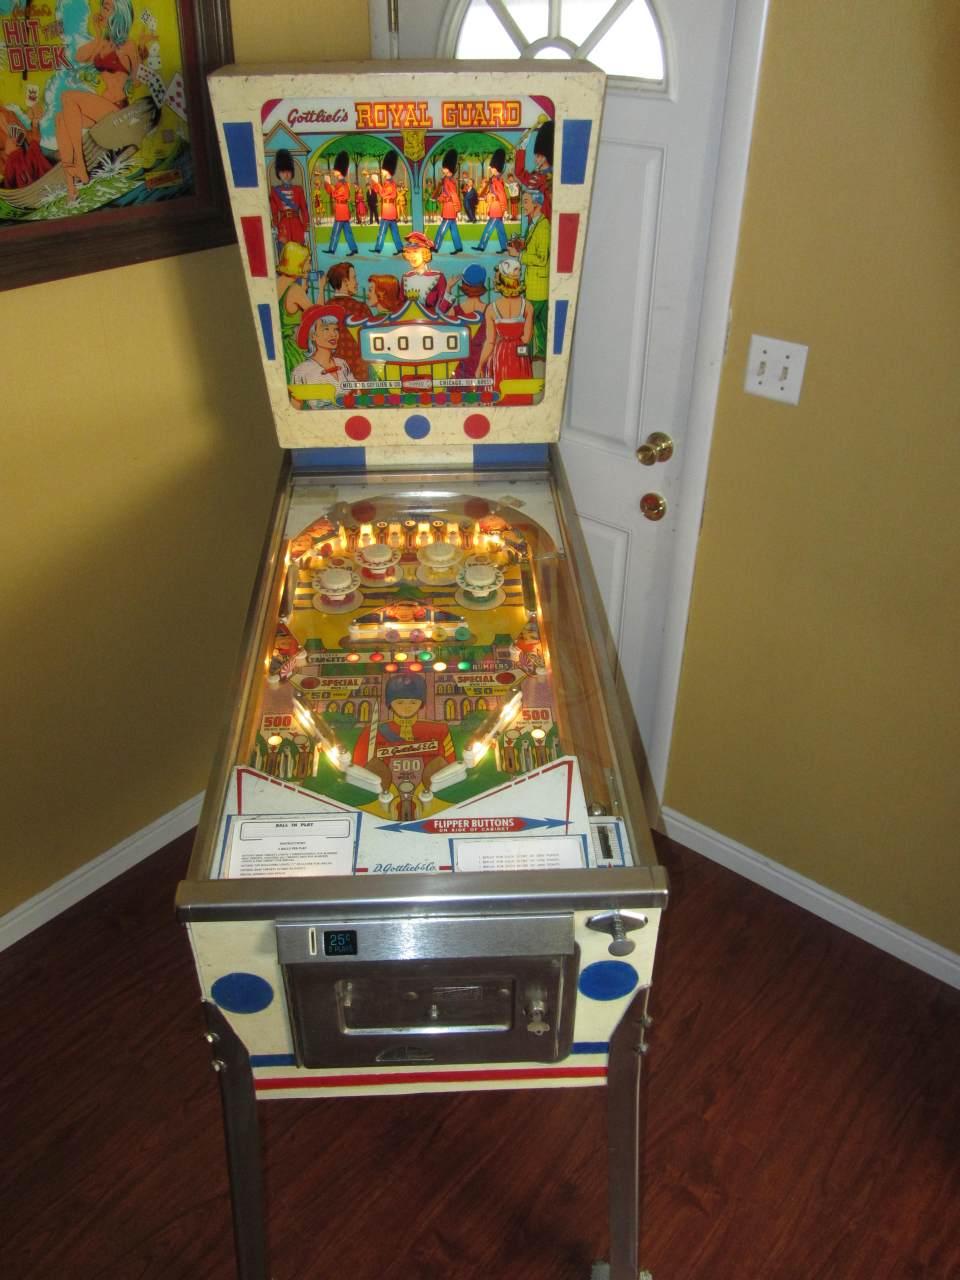 Gottlieb Royal Guard Pinball Machine 1 Pinballmania Llc